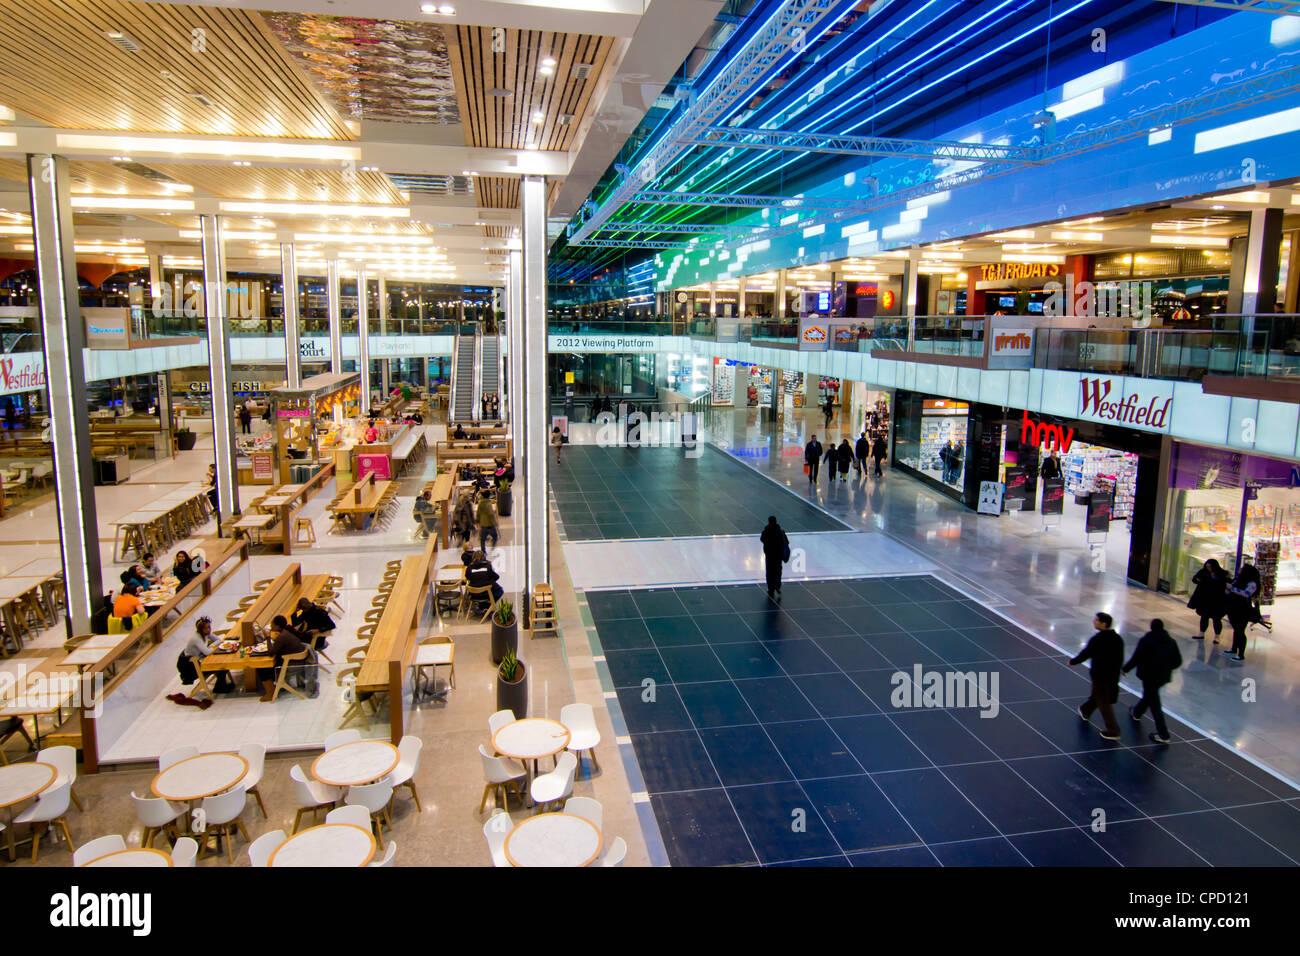 Interior of Westfield shopping centre, Stratford, London, England, United Kingdom, Europe - Stock Image